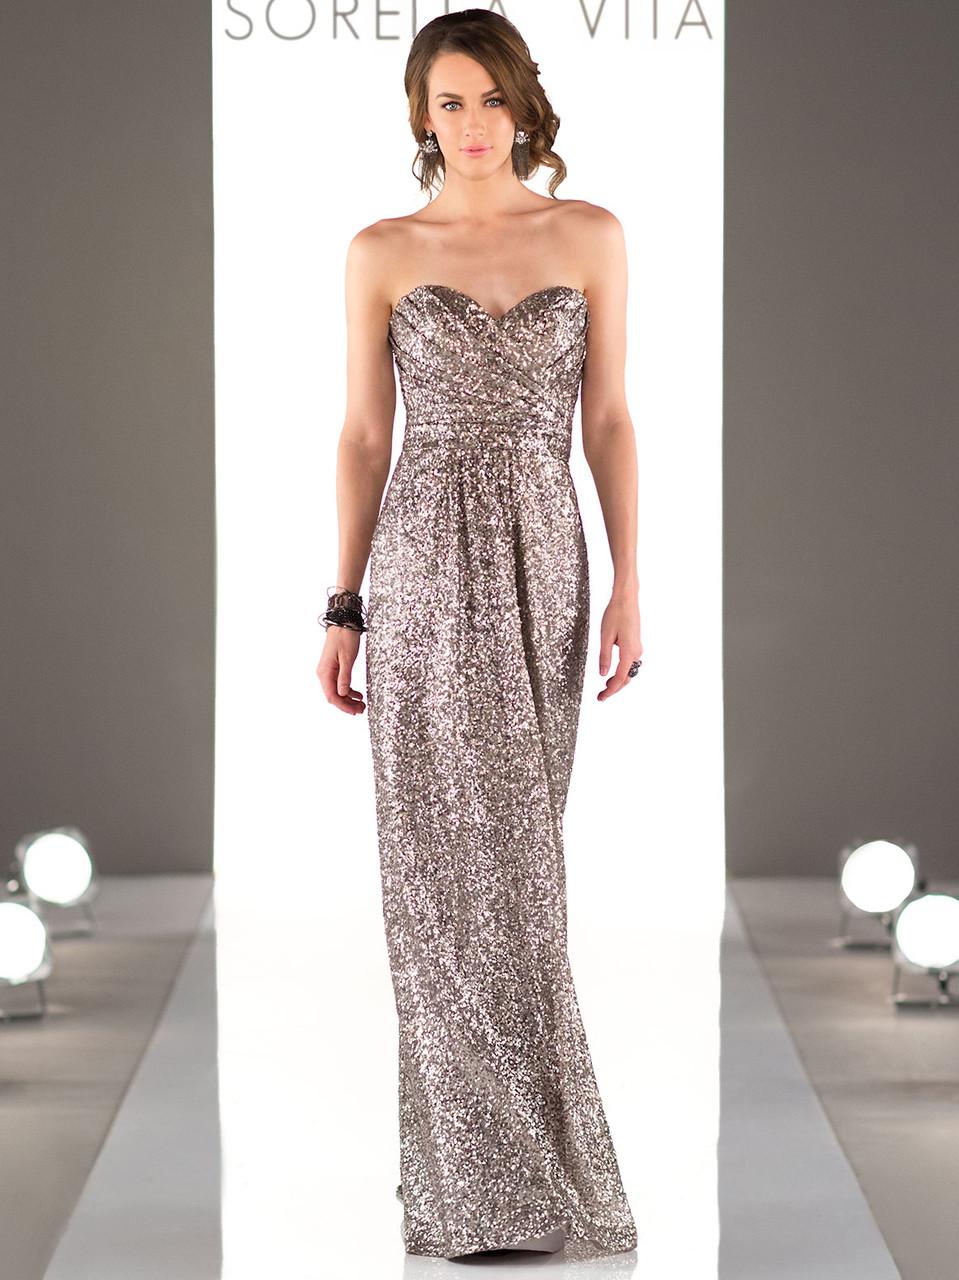 8746726b Sorella Vita 8834 Sequin Floor Length Bridesmaid Dress ...